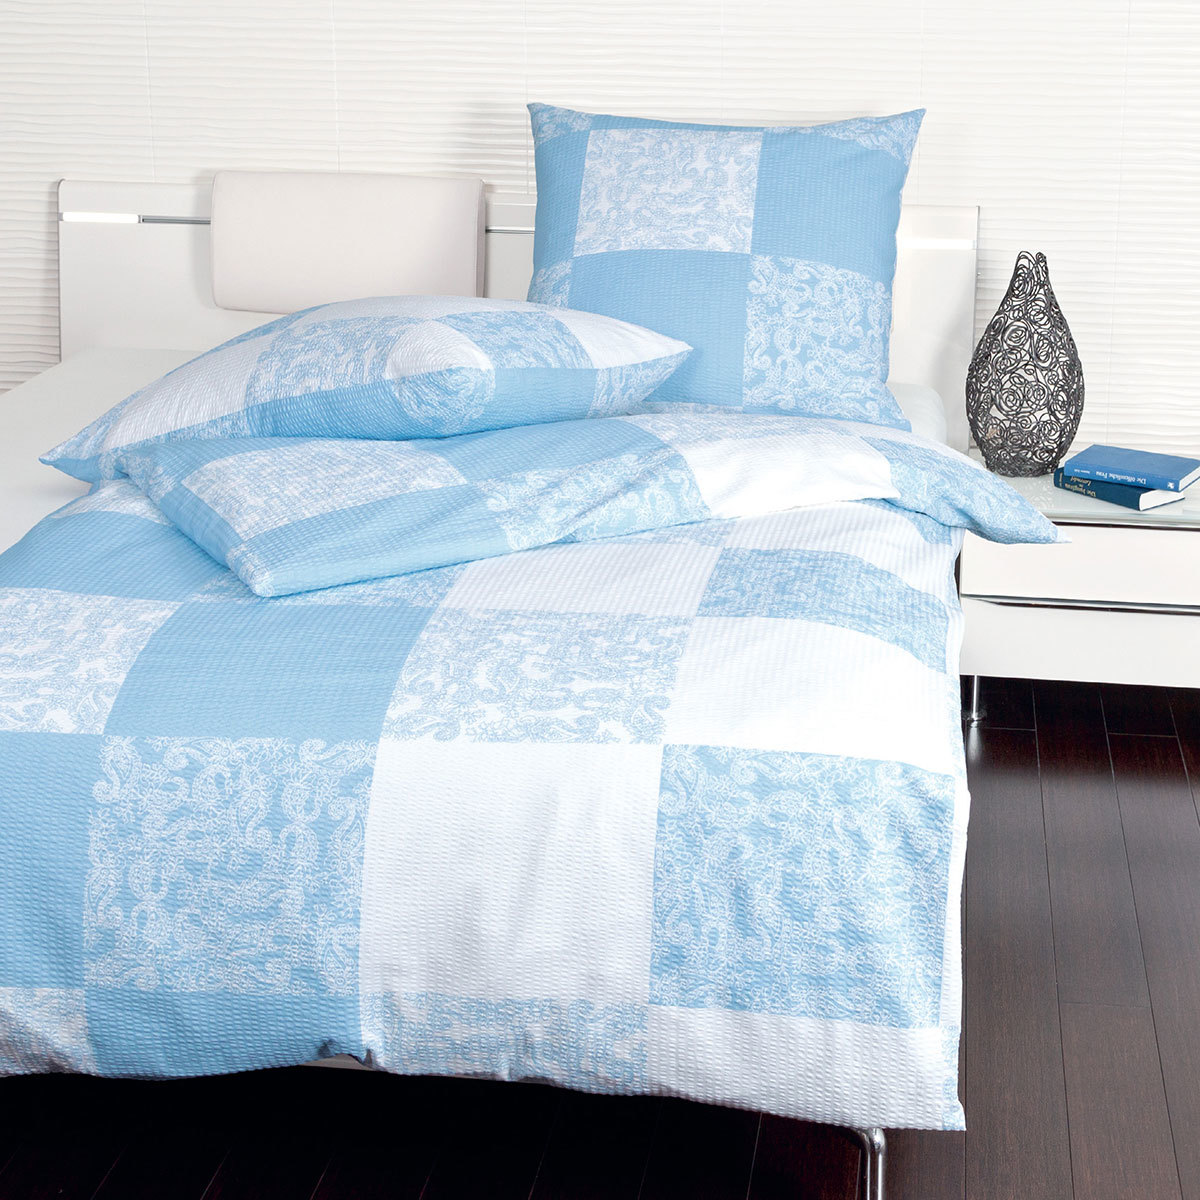 janine seersucker bettw sche tango 20037 02 blau g nstig online kaufen bei bettwaren shop. Black Bedroom Furniture Sets. Home Design Ideas